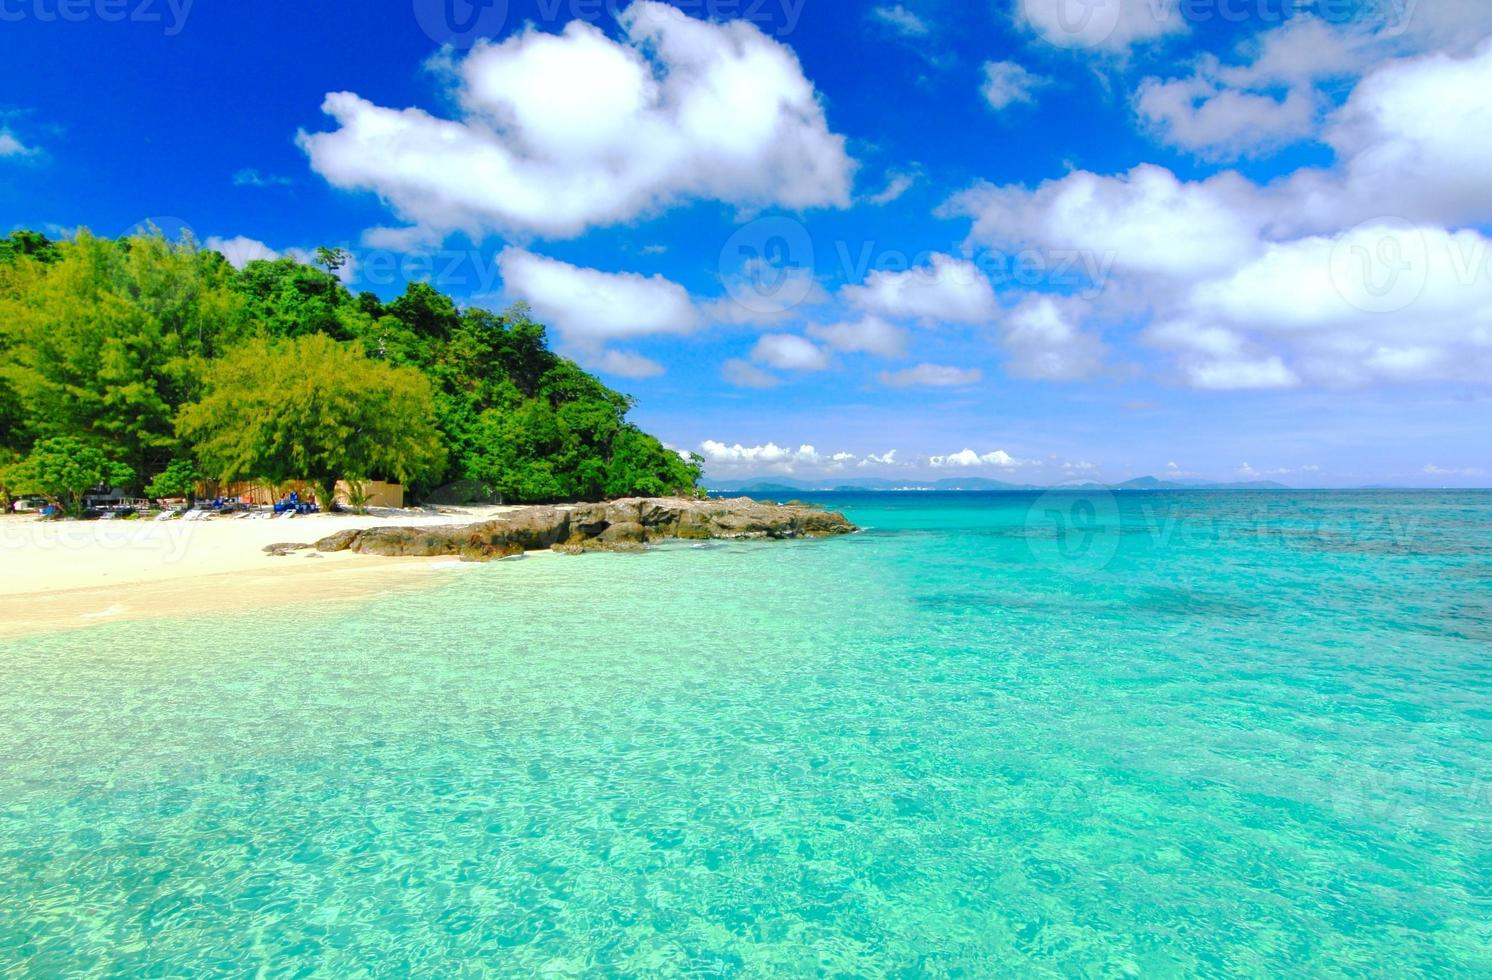 Paradise beach in Koh maiton island , phuket ,Thailand photo